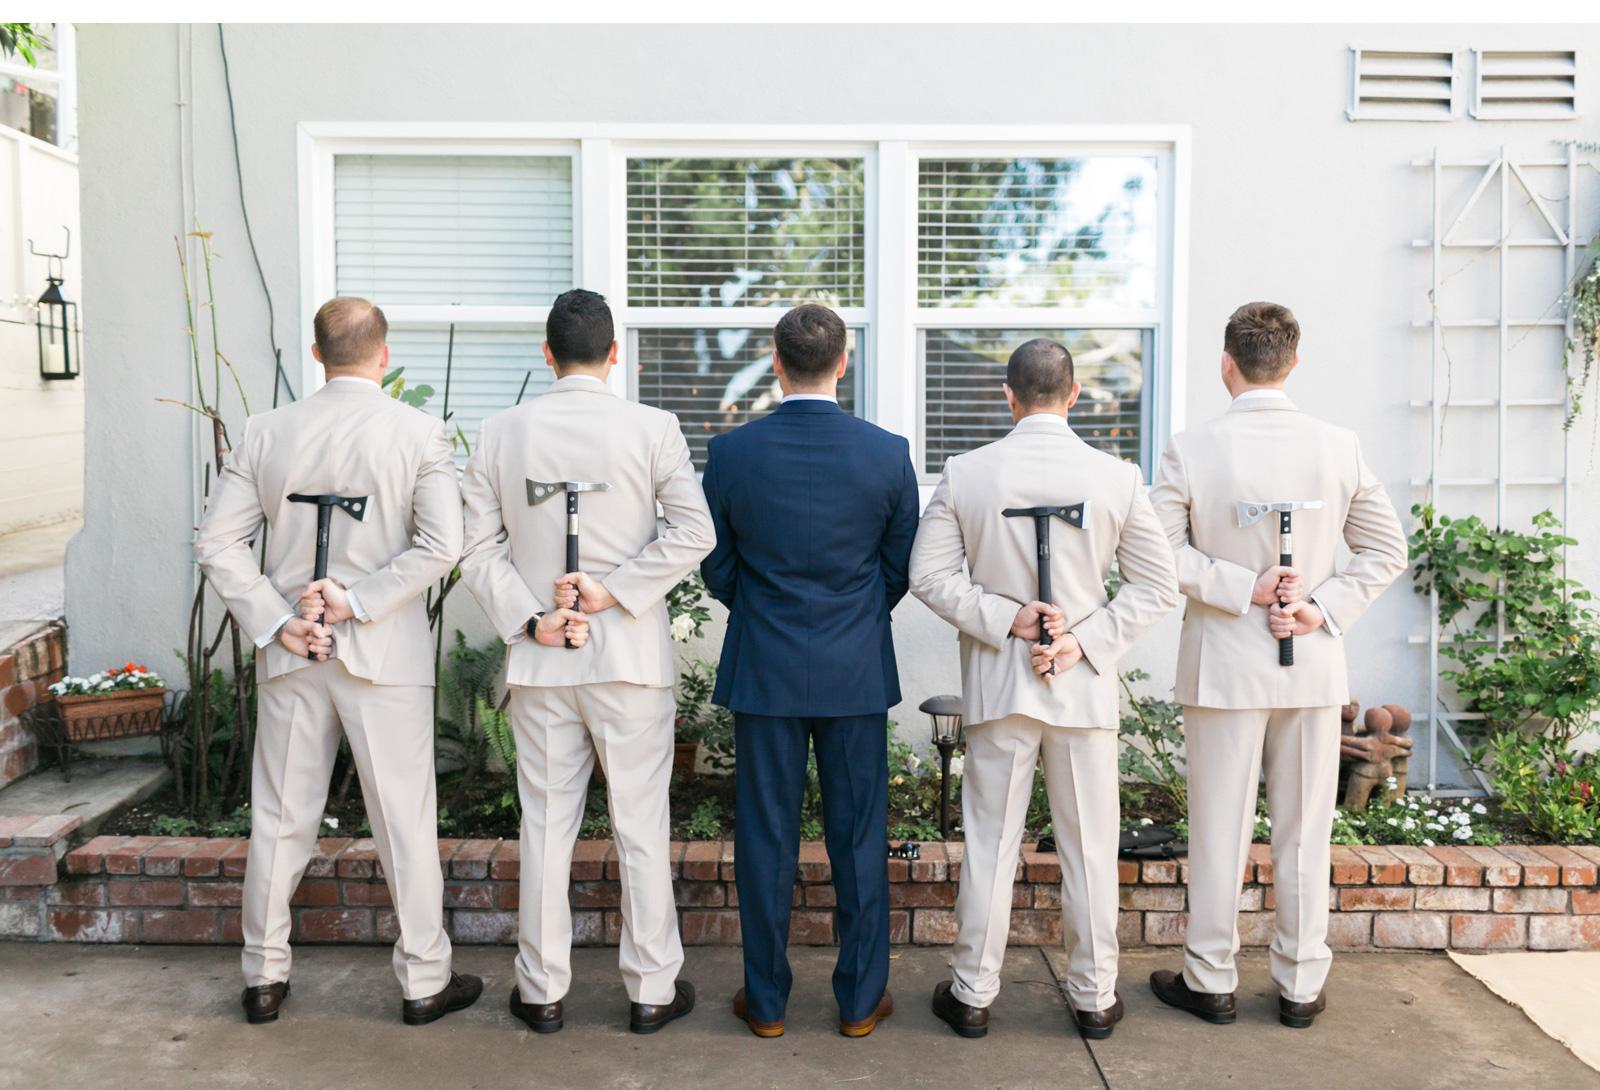 Private-Estate-Backyard-Wedding-Natalie-Schutt-Photography_07.jpg